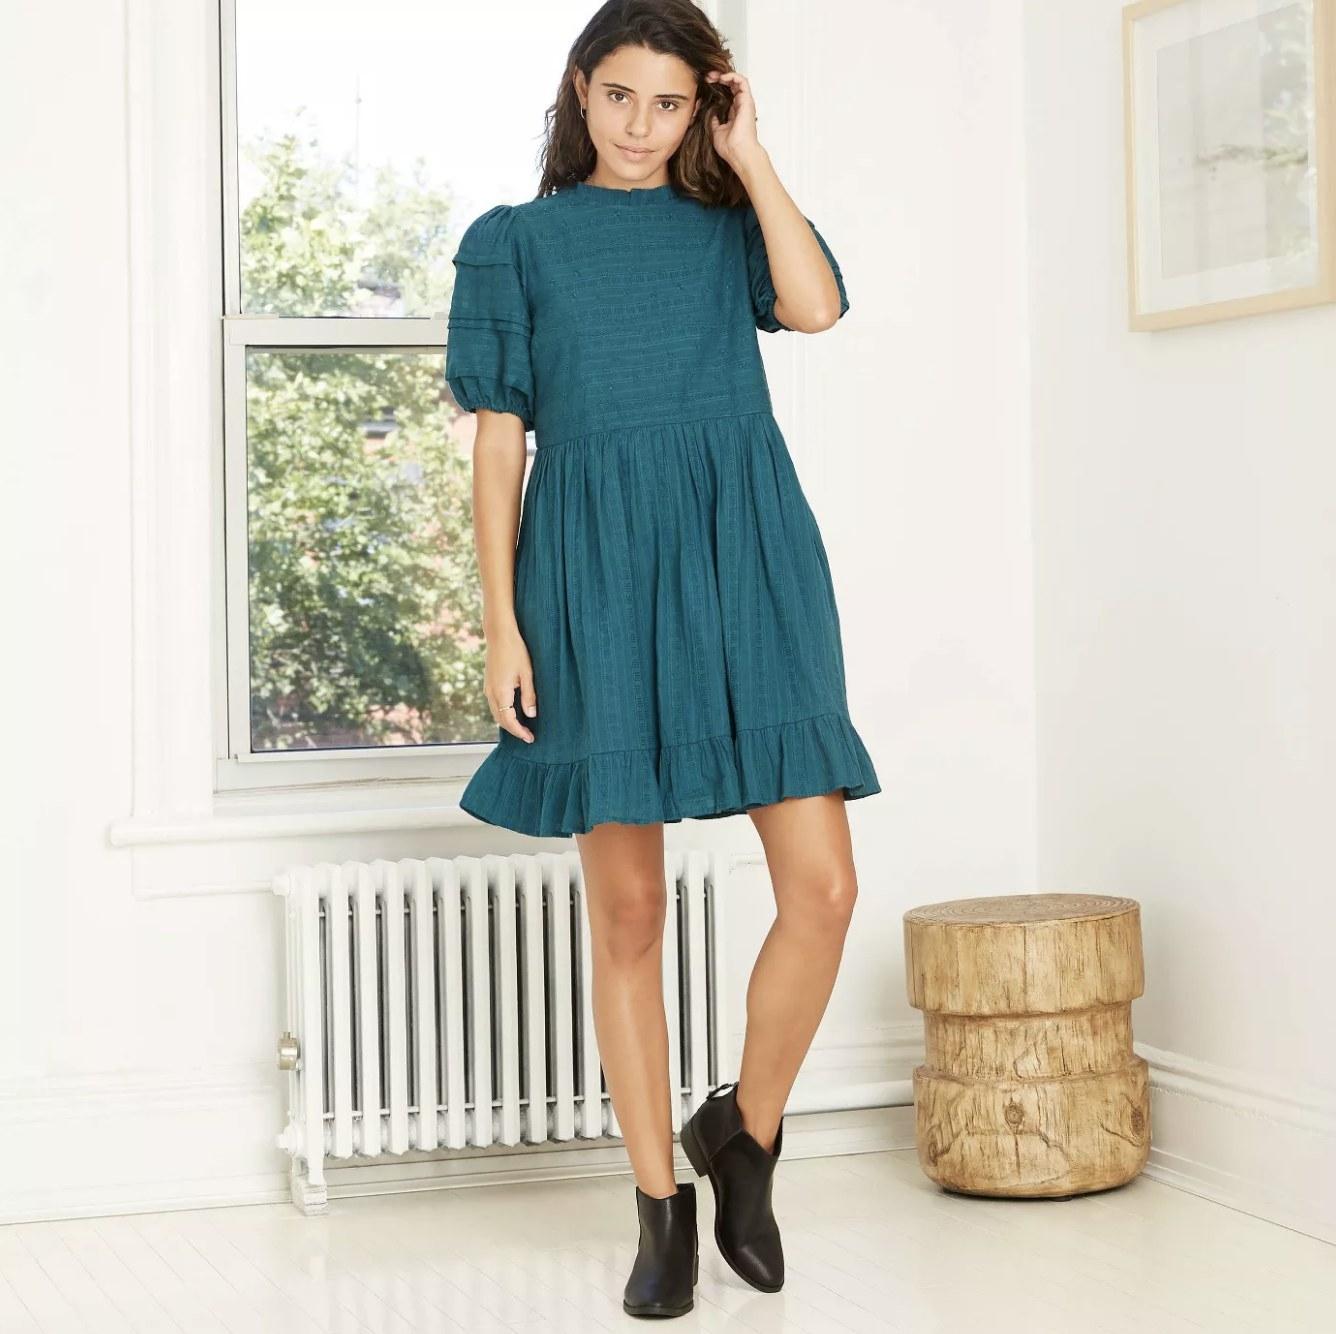 teal puff short-sleeve eyelet dress